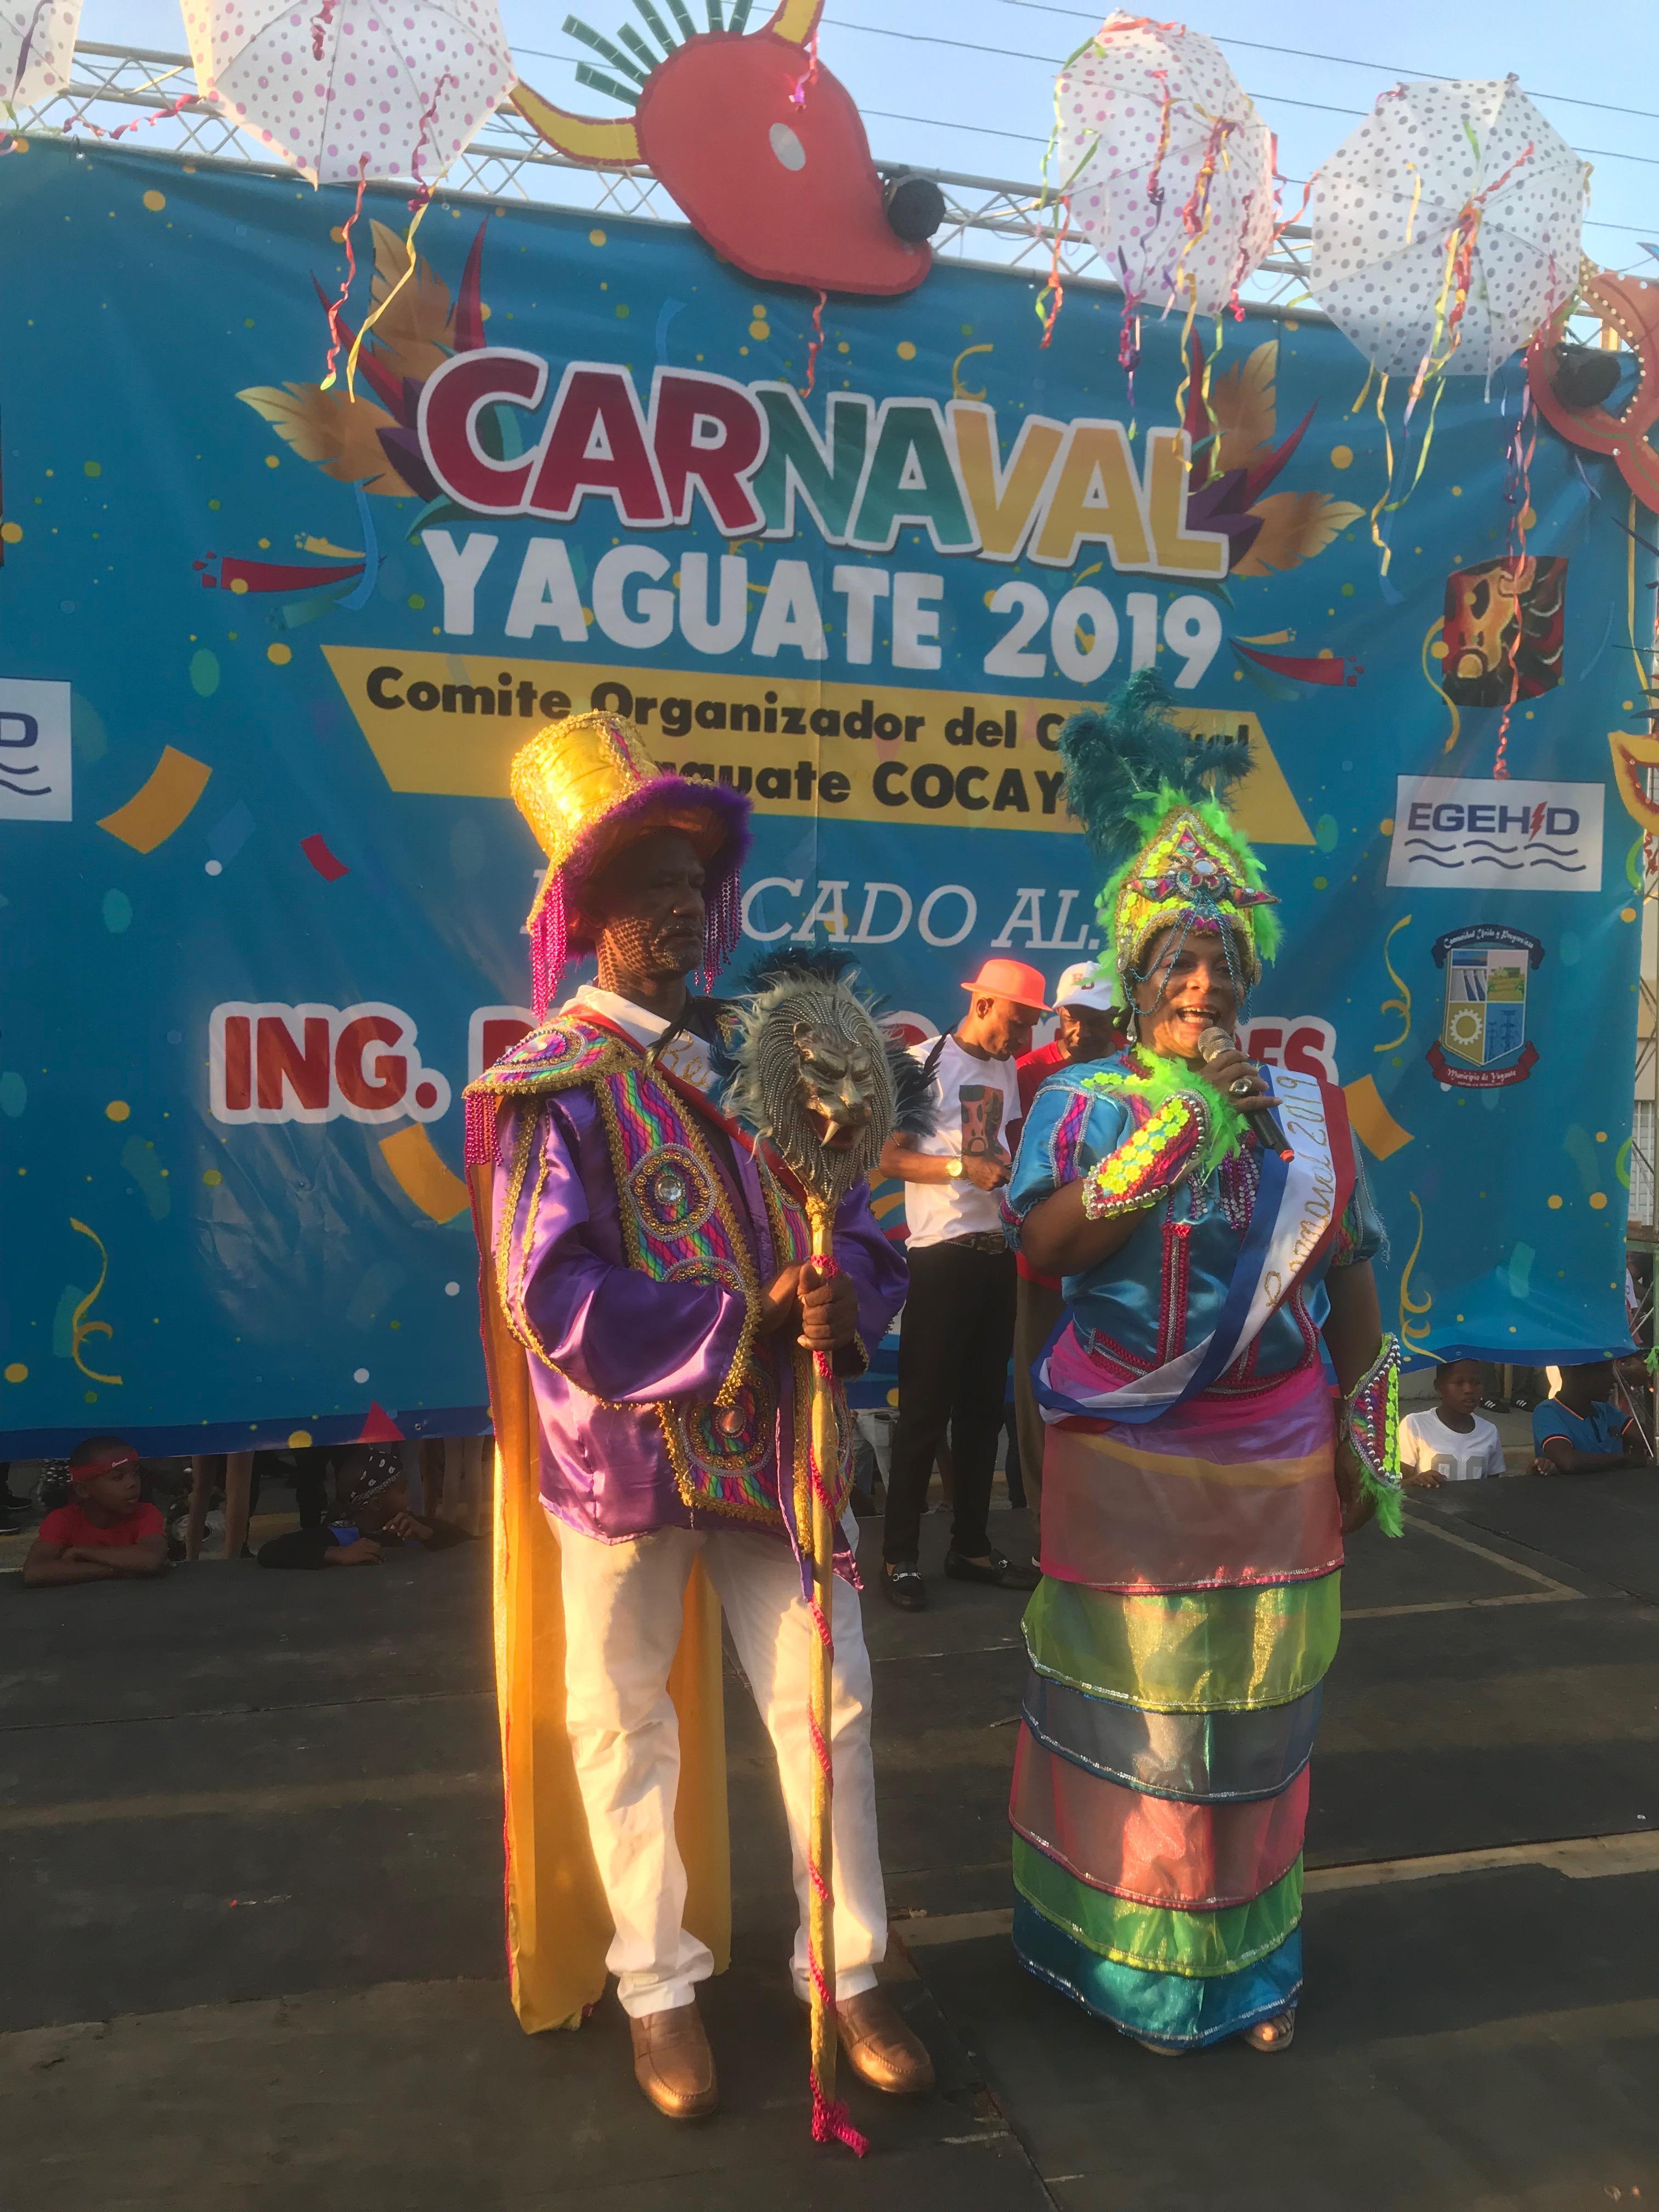 Carnaval Popular Yaguate 2019 (COCAYA)